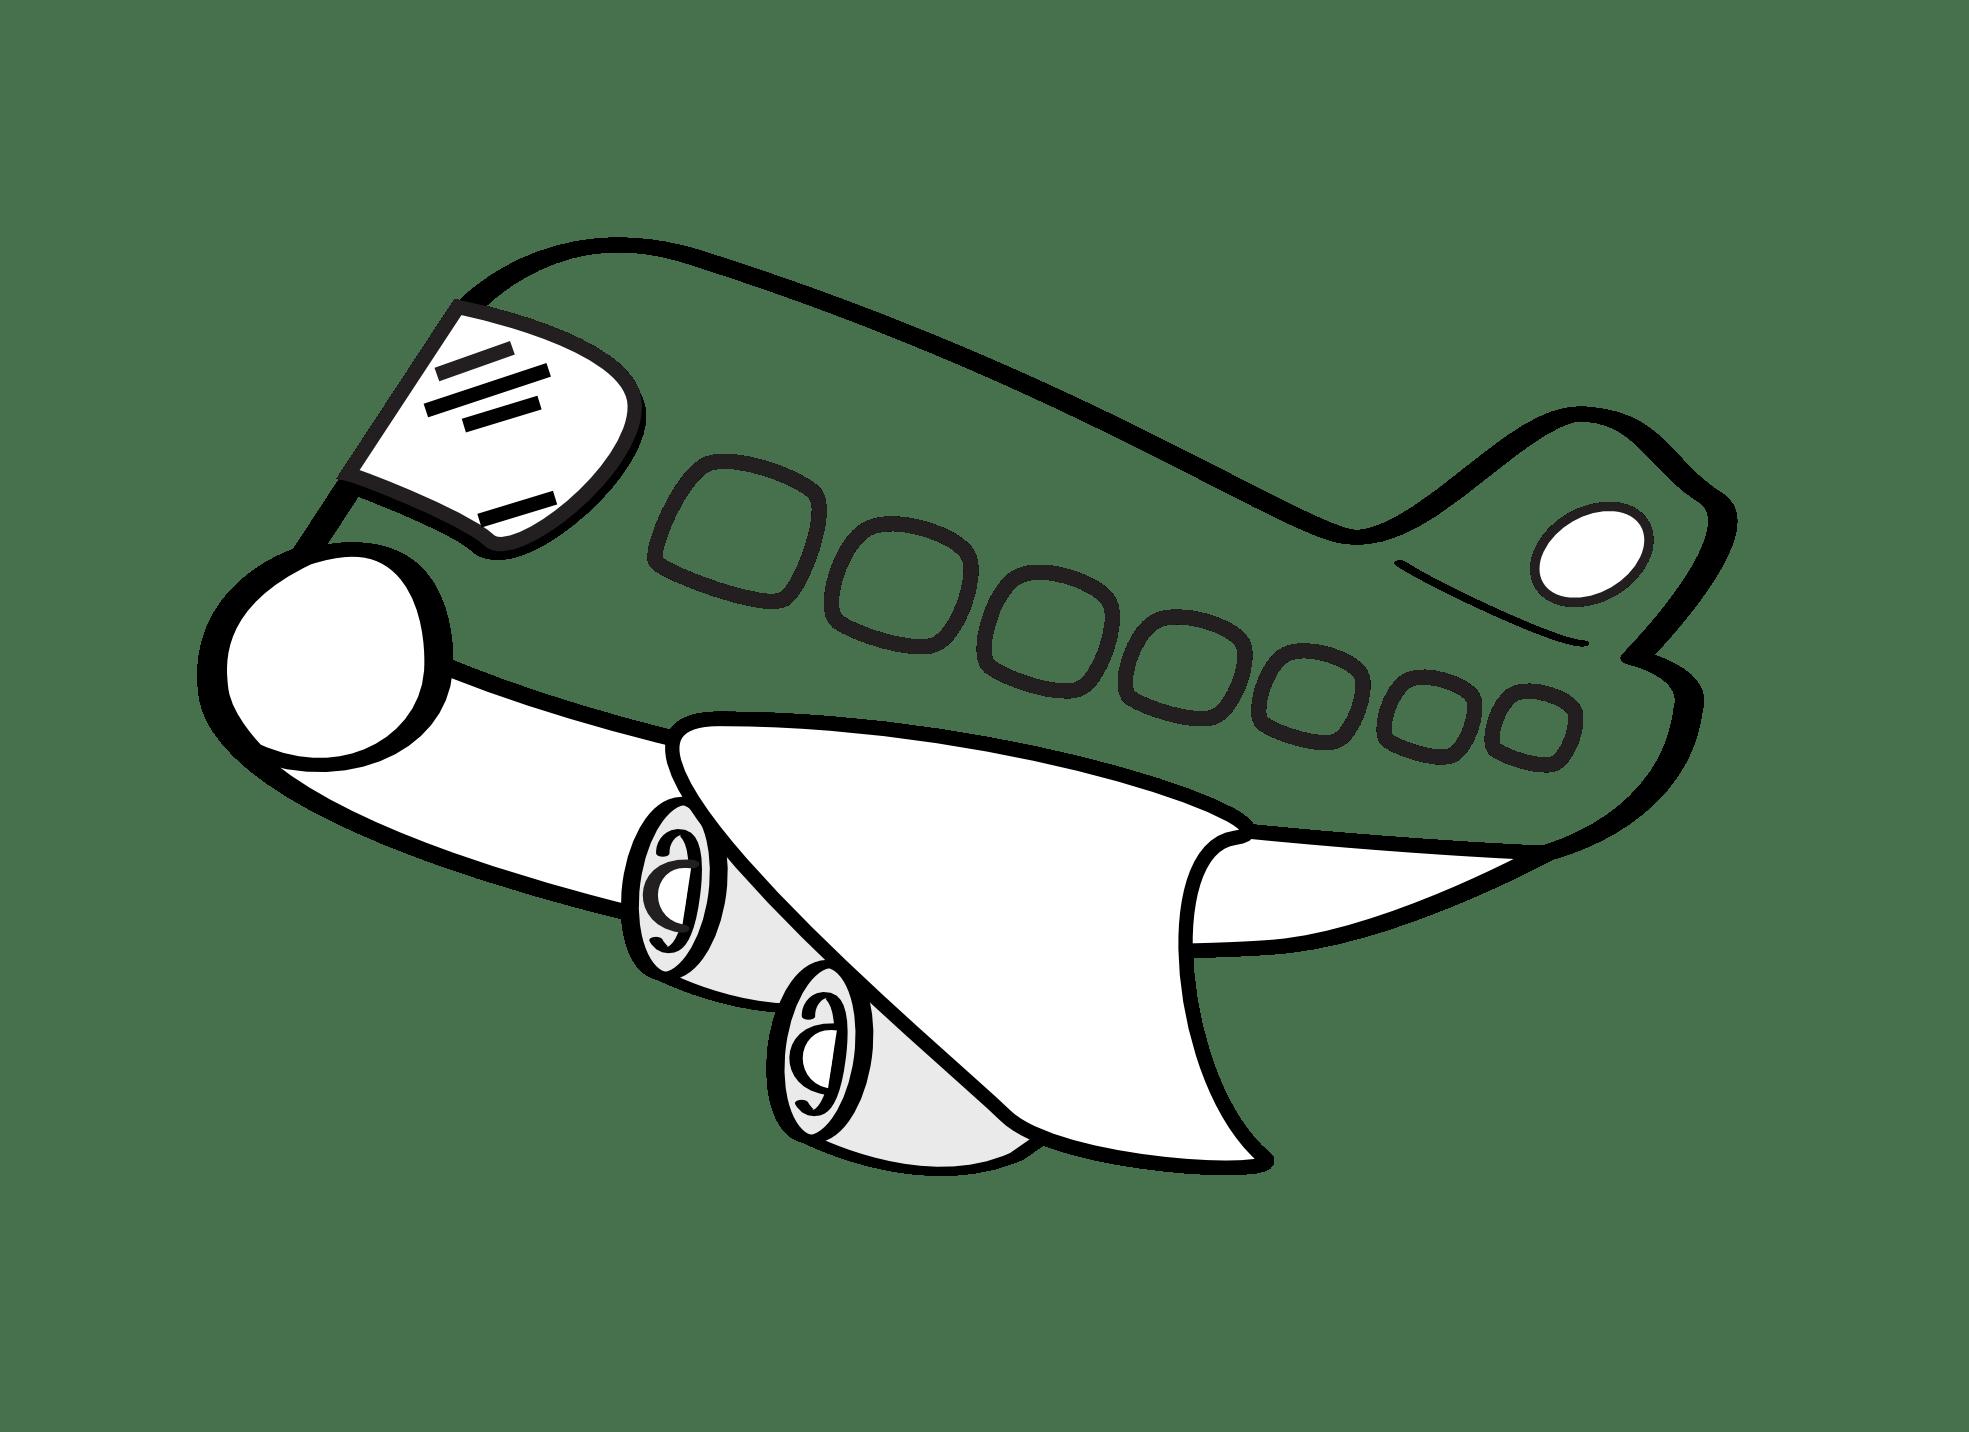 Black And White Cartoon Plane